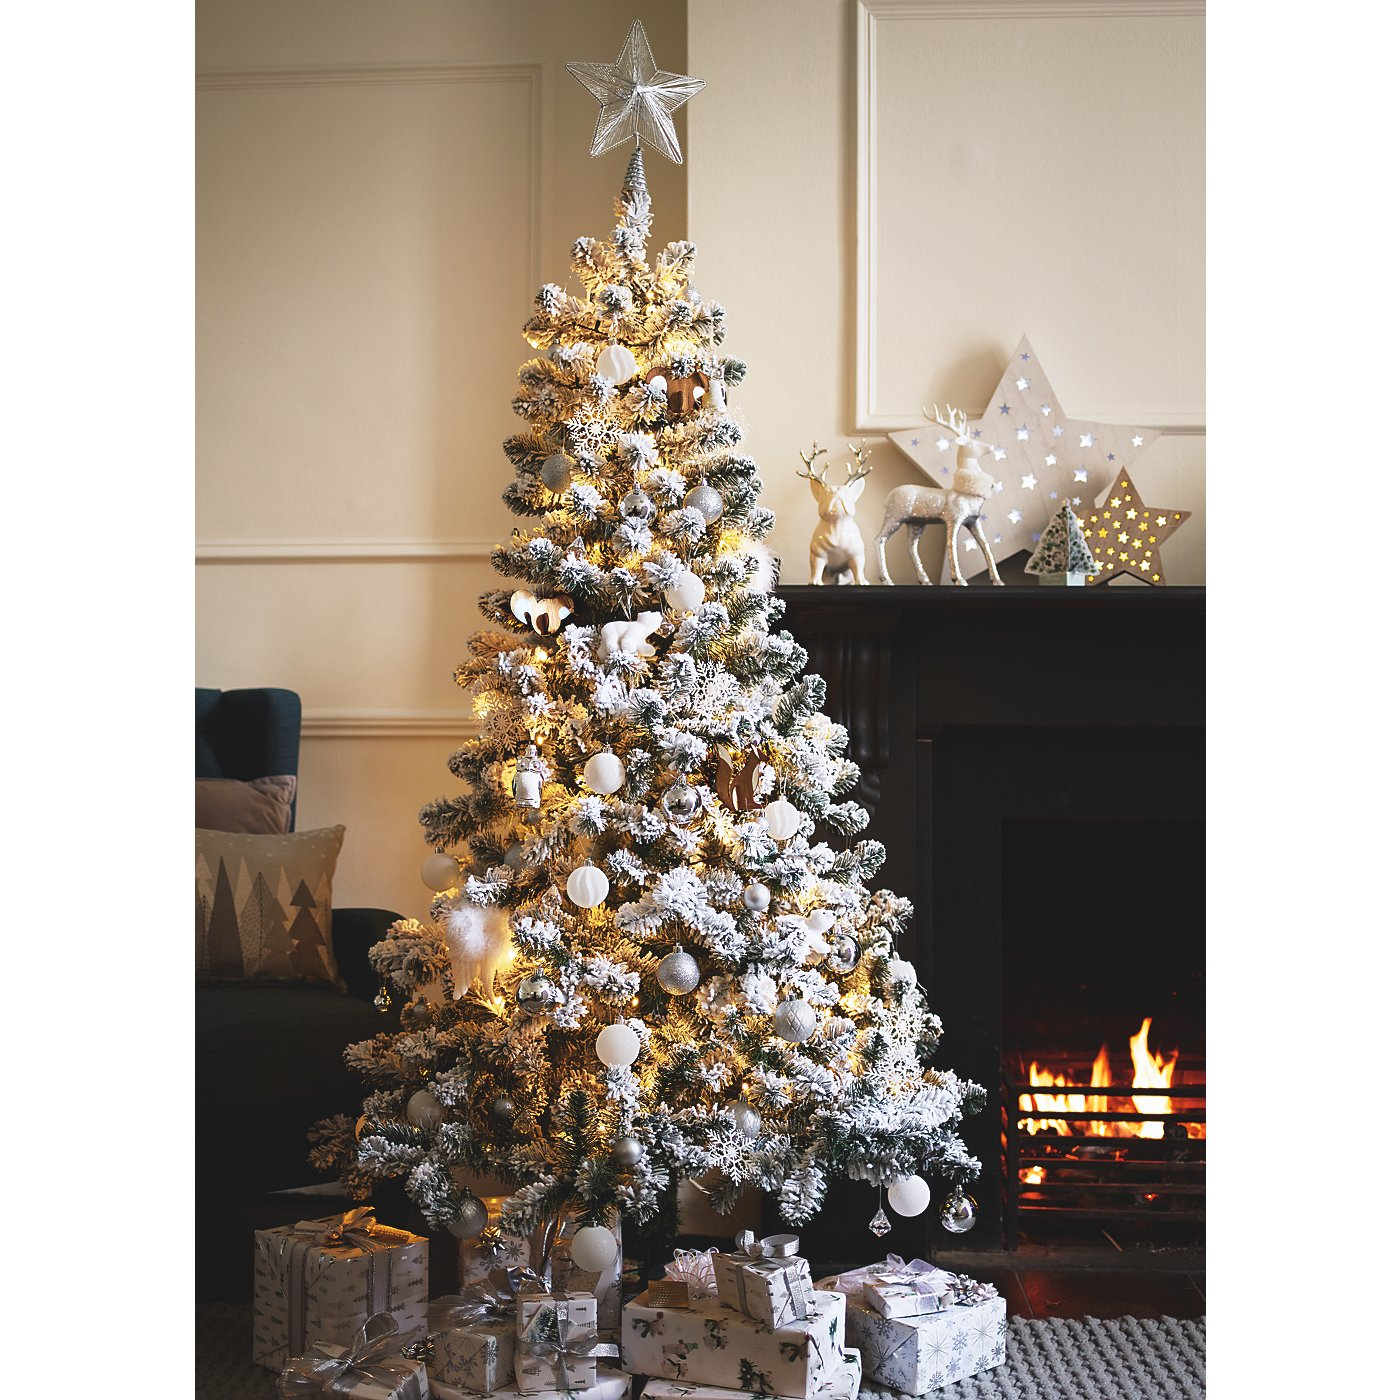 Asda Christmas Trees: White Christmas Decorations Asda